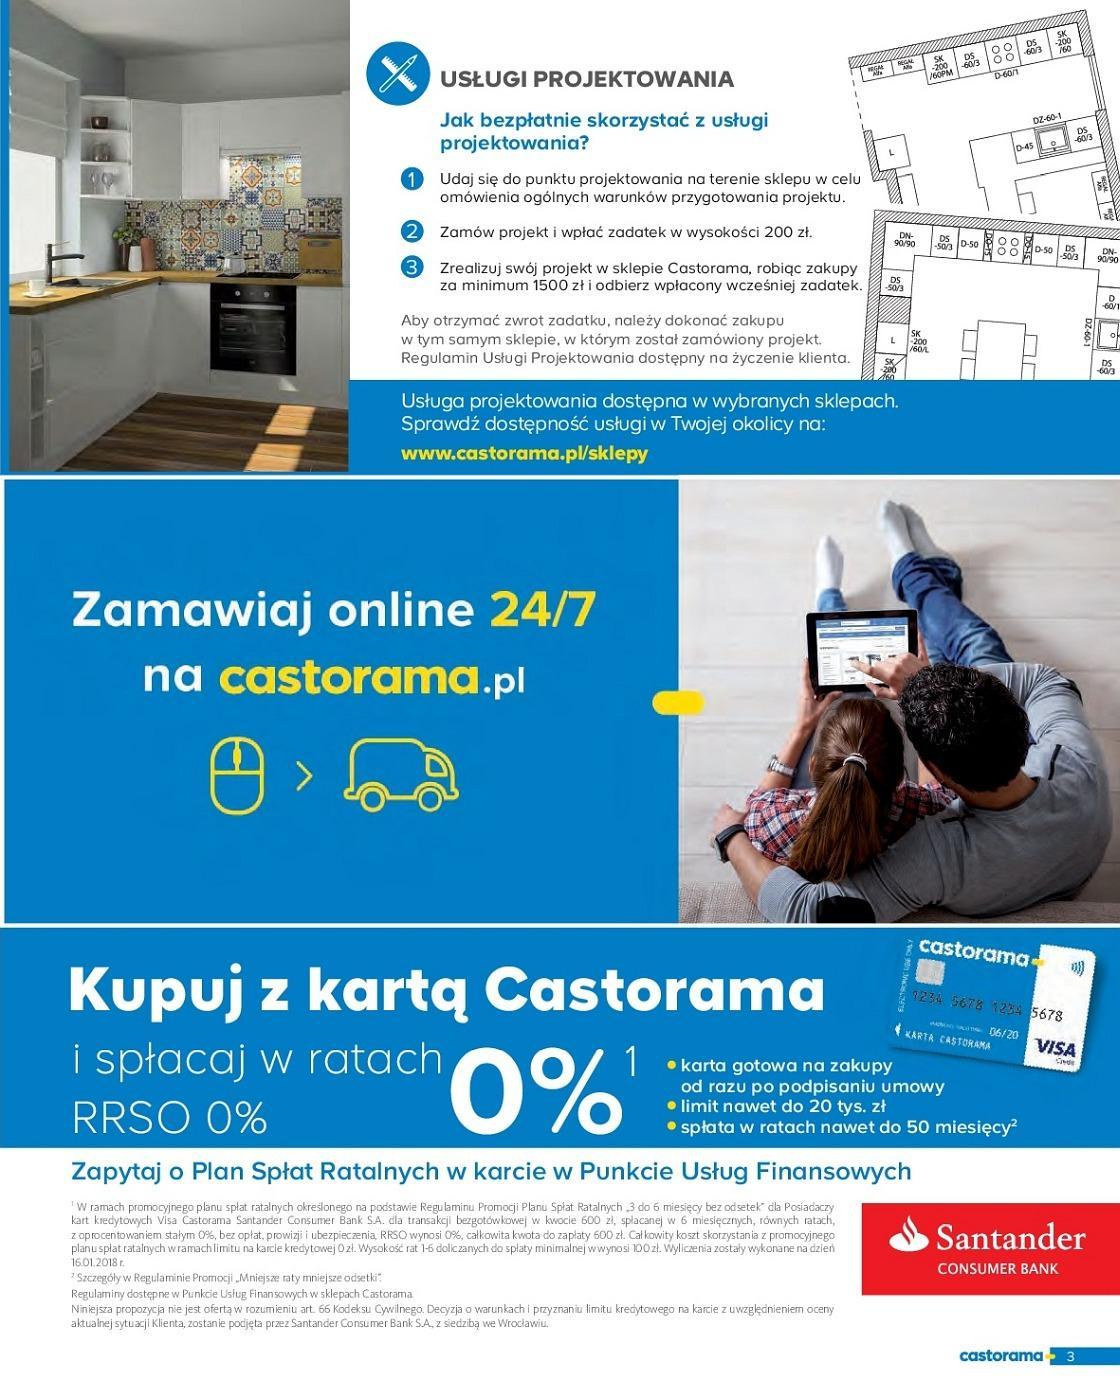 Gazetka promocyjna Castorama do 31/12/2018 str.3